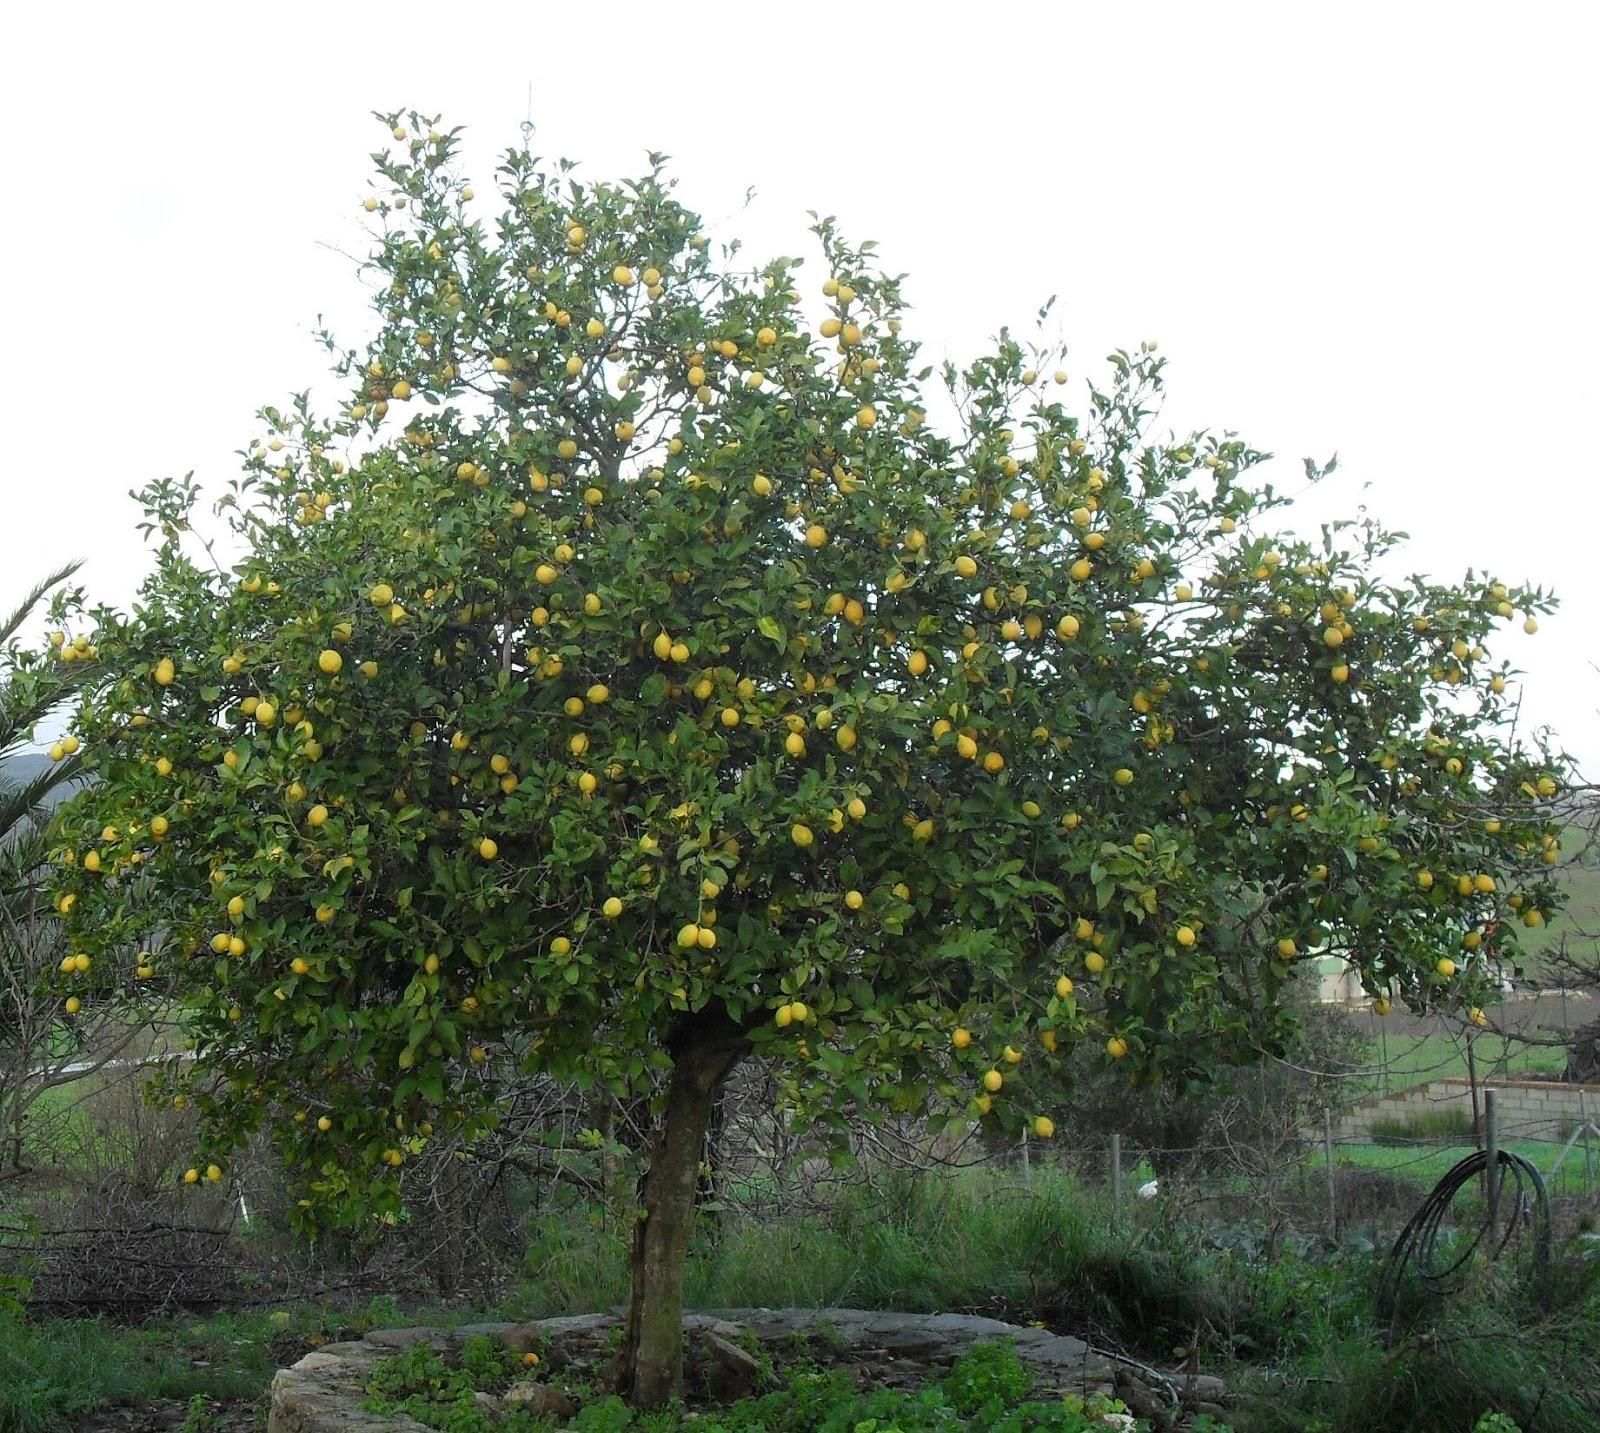 Cultiva tu mismo como se poda un limonero - Poda de hortensias epoca ...